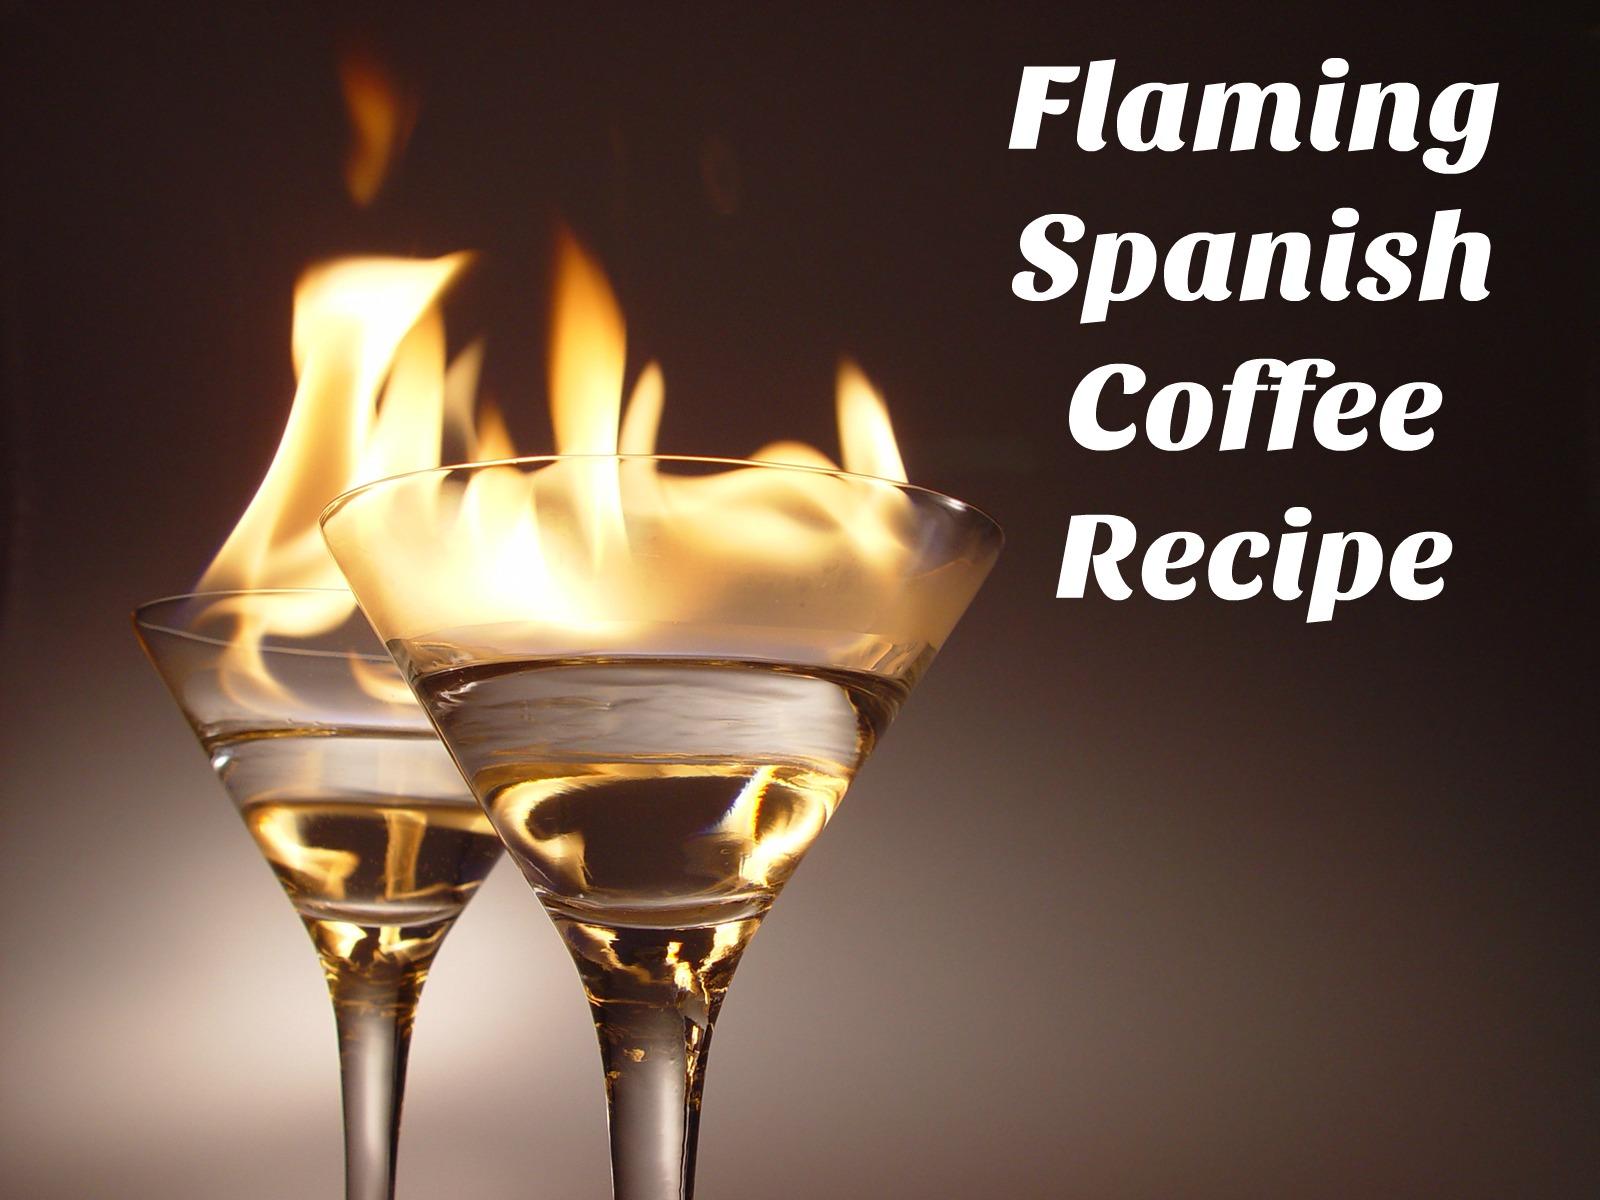 flaming spanish coffee recipe shopping kim. Black Bedroom Furniture Sets. Home Design Ideas